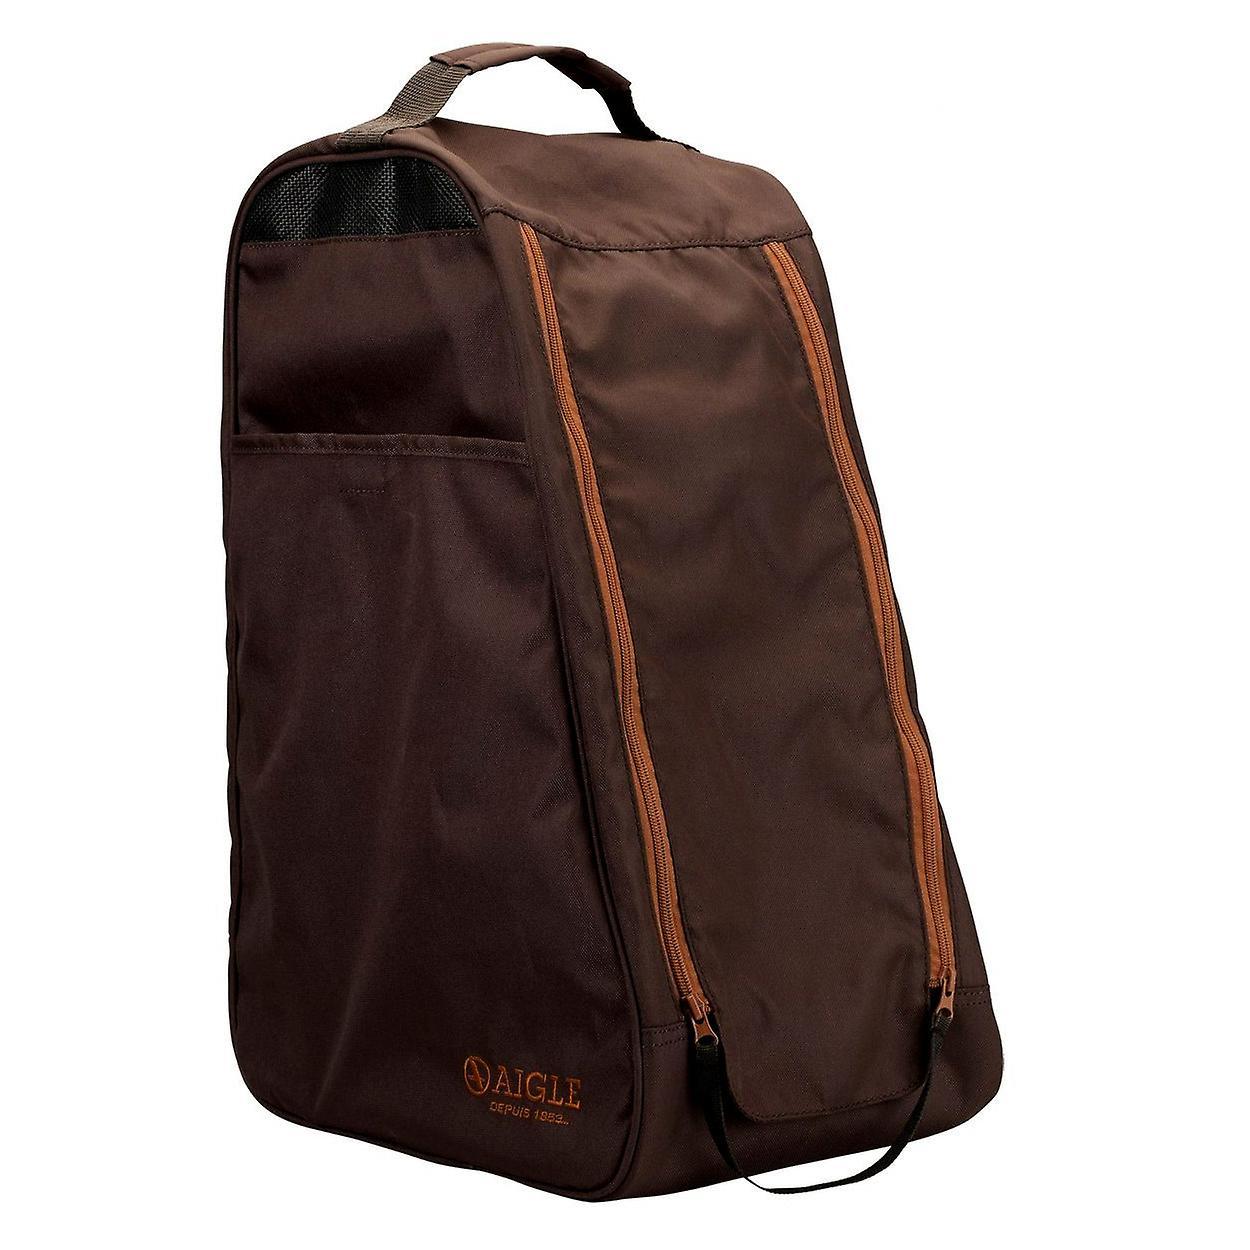 Aigle Dark Brown boot bag - wellington boot or shoe carrier - waterproof bag